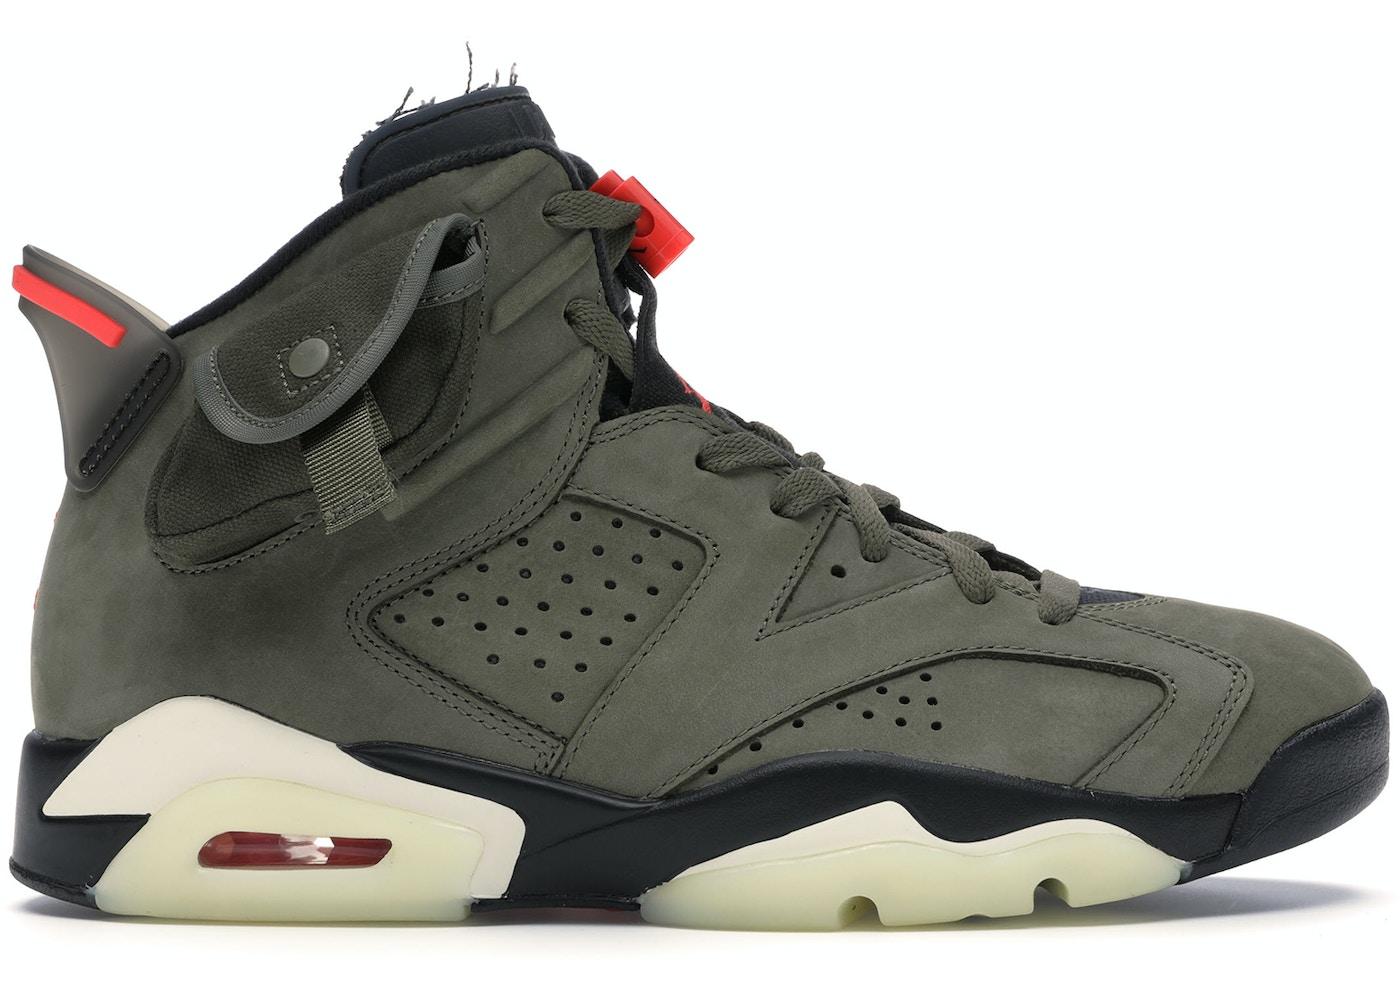 fresh styles dirt cheap order Buy Air Jordan Shoes & Deadstock Sneakers